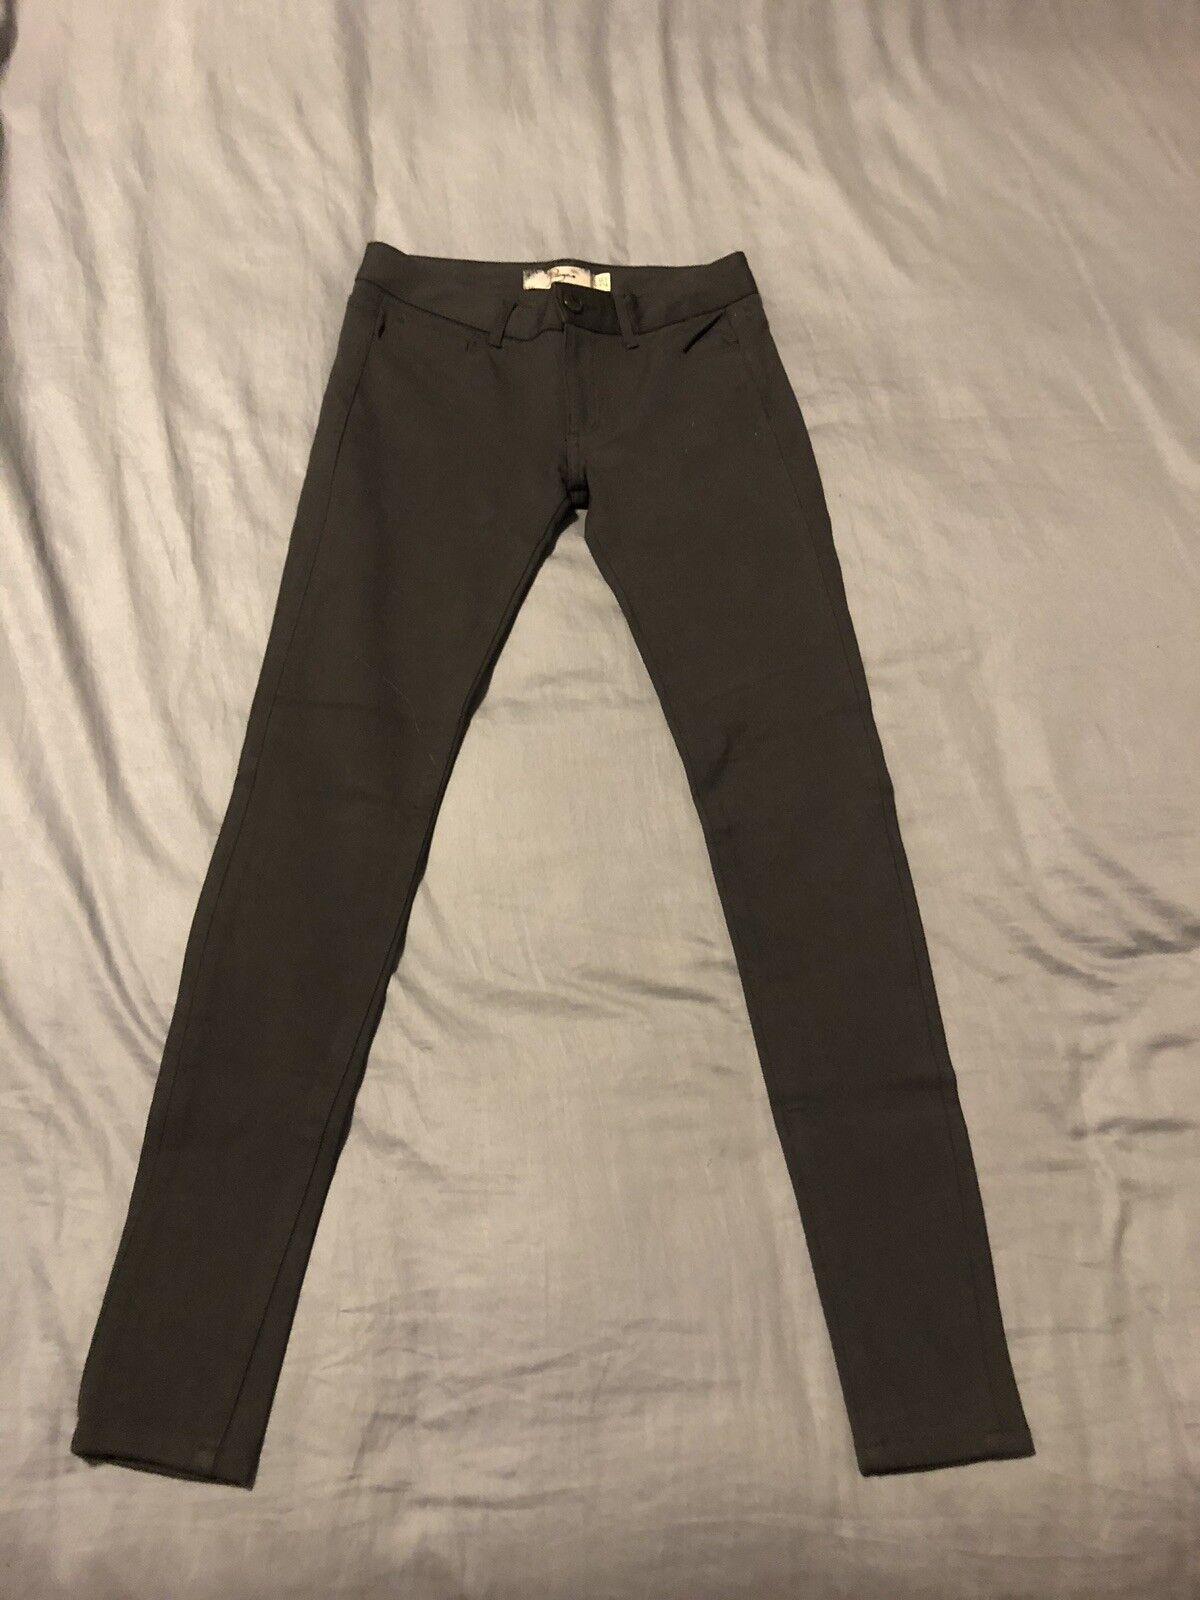 NWOT Women's Paige Denim Peg Super Skinny Pant Jeans sz 25